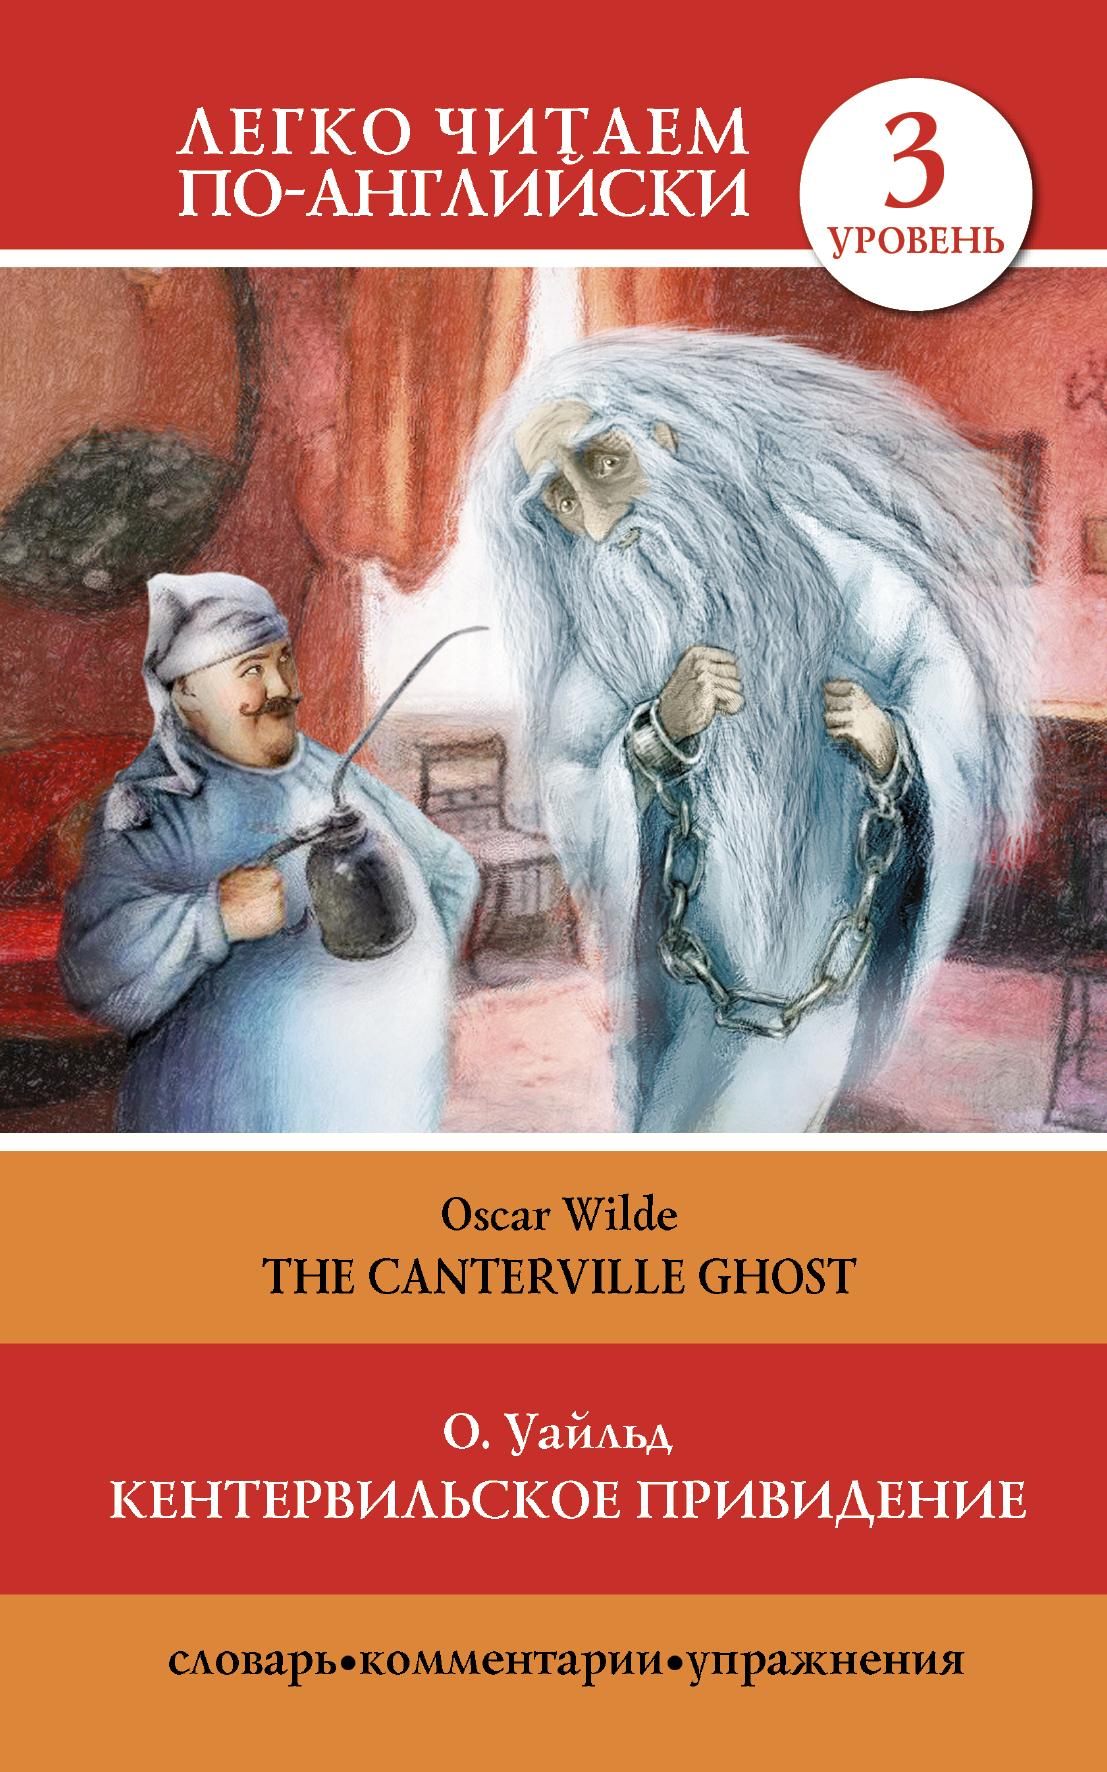 Кентервильское привидение = The Canterville Ghost